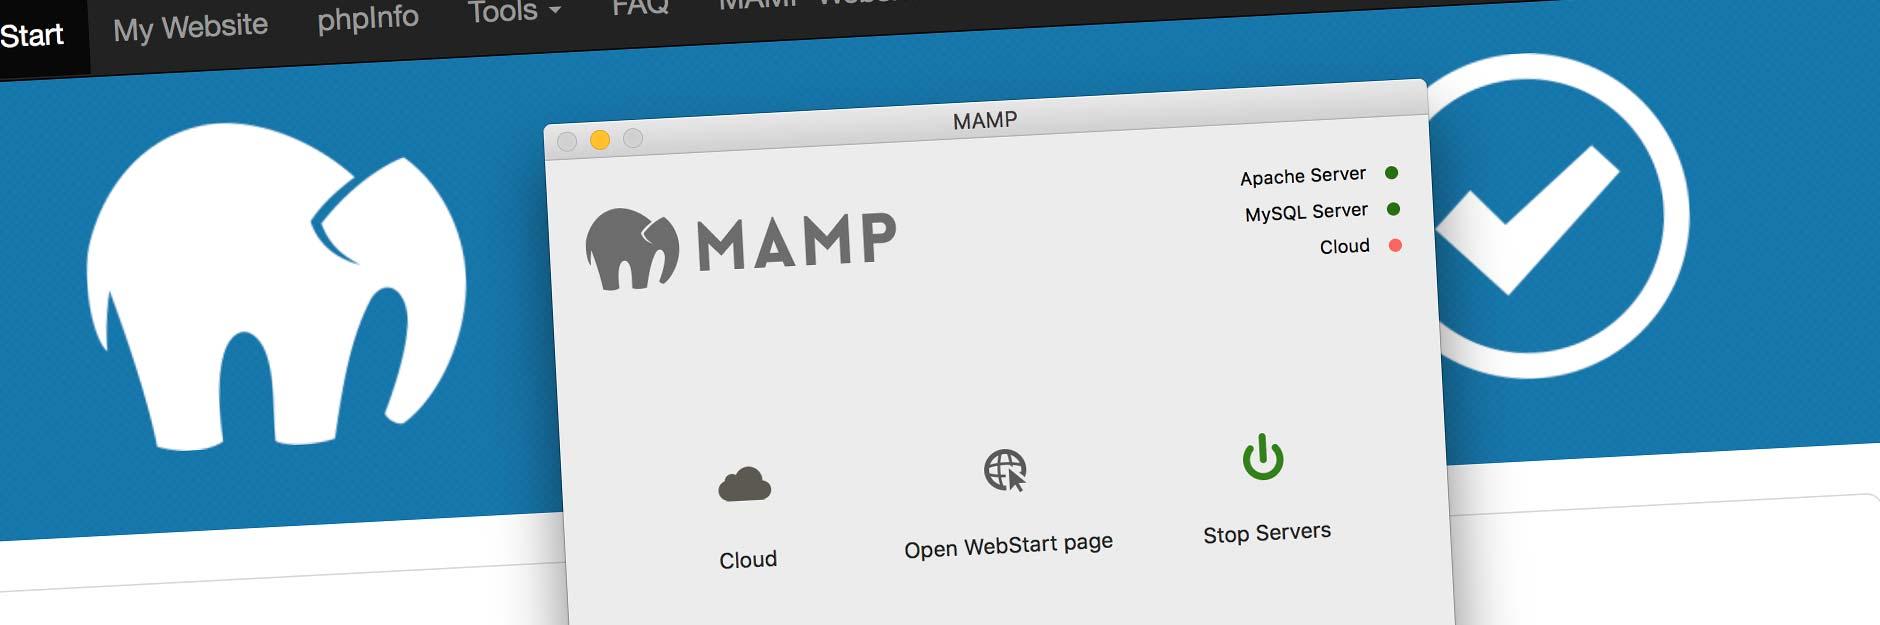 【WordPress】公開中のWordPressをローカルサーバー環境にコピーしたい【MAMP】